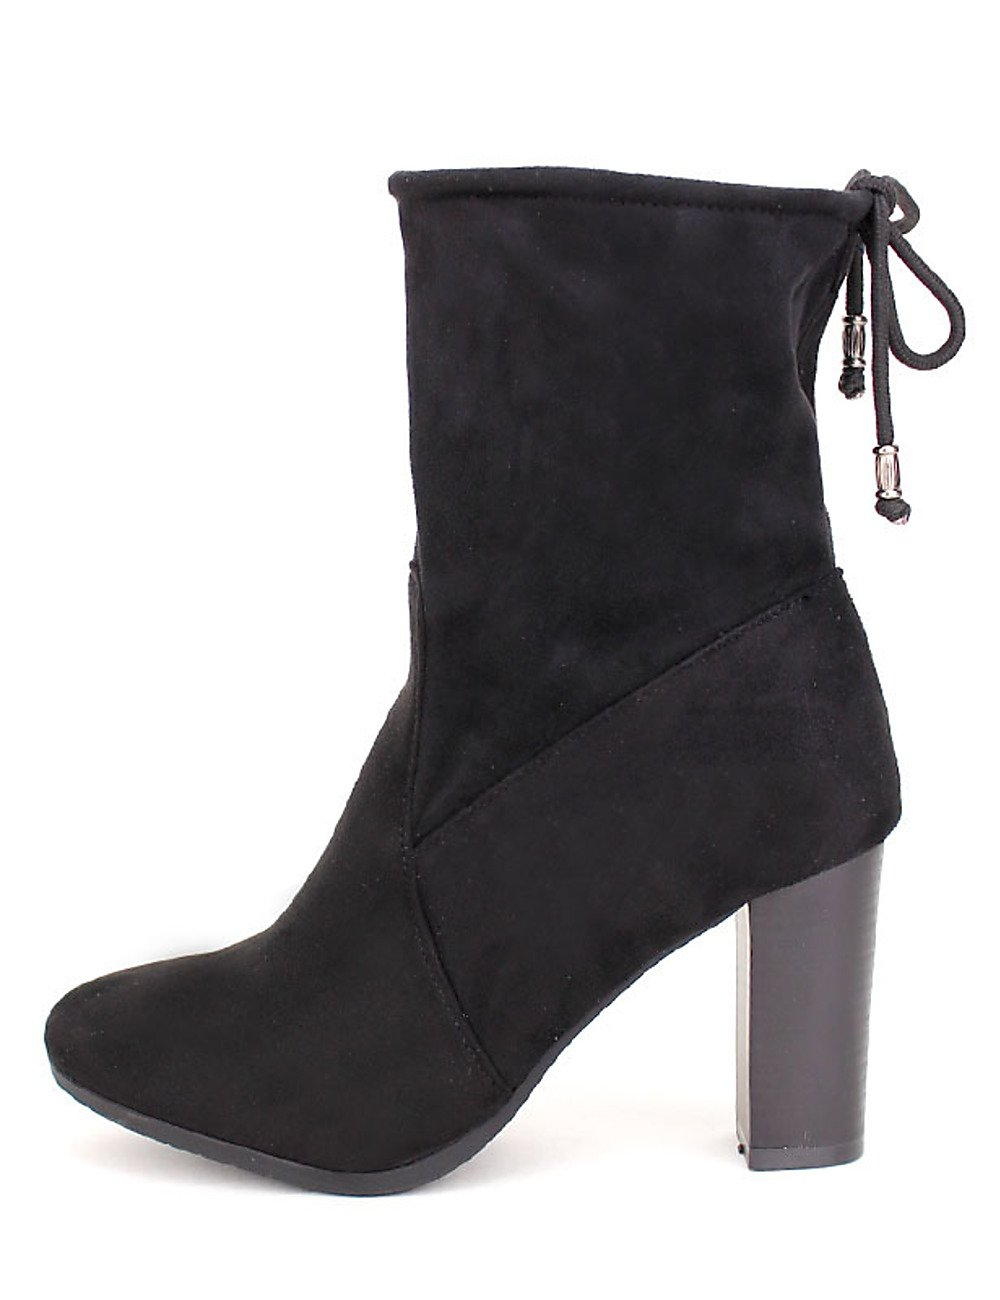 Cendriyon, Bottines Diza Noir Noires Daim Diza Chaussures Bottines Femme Noir 2480324 - reprogrammed.space